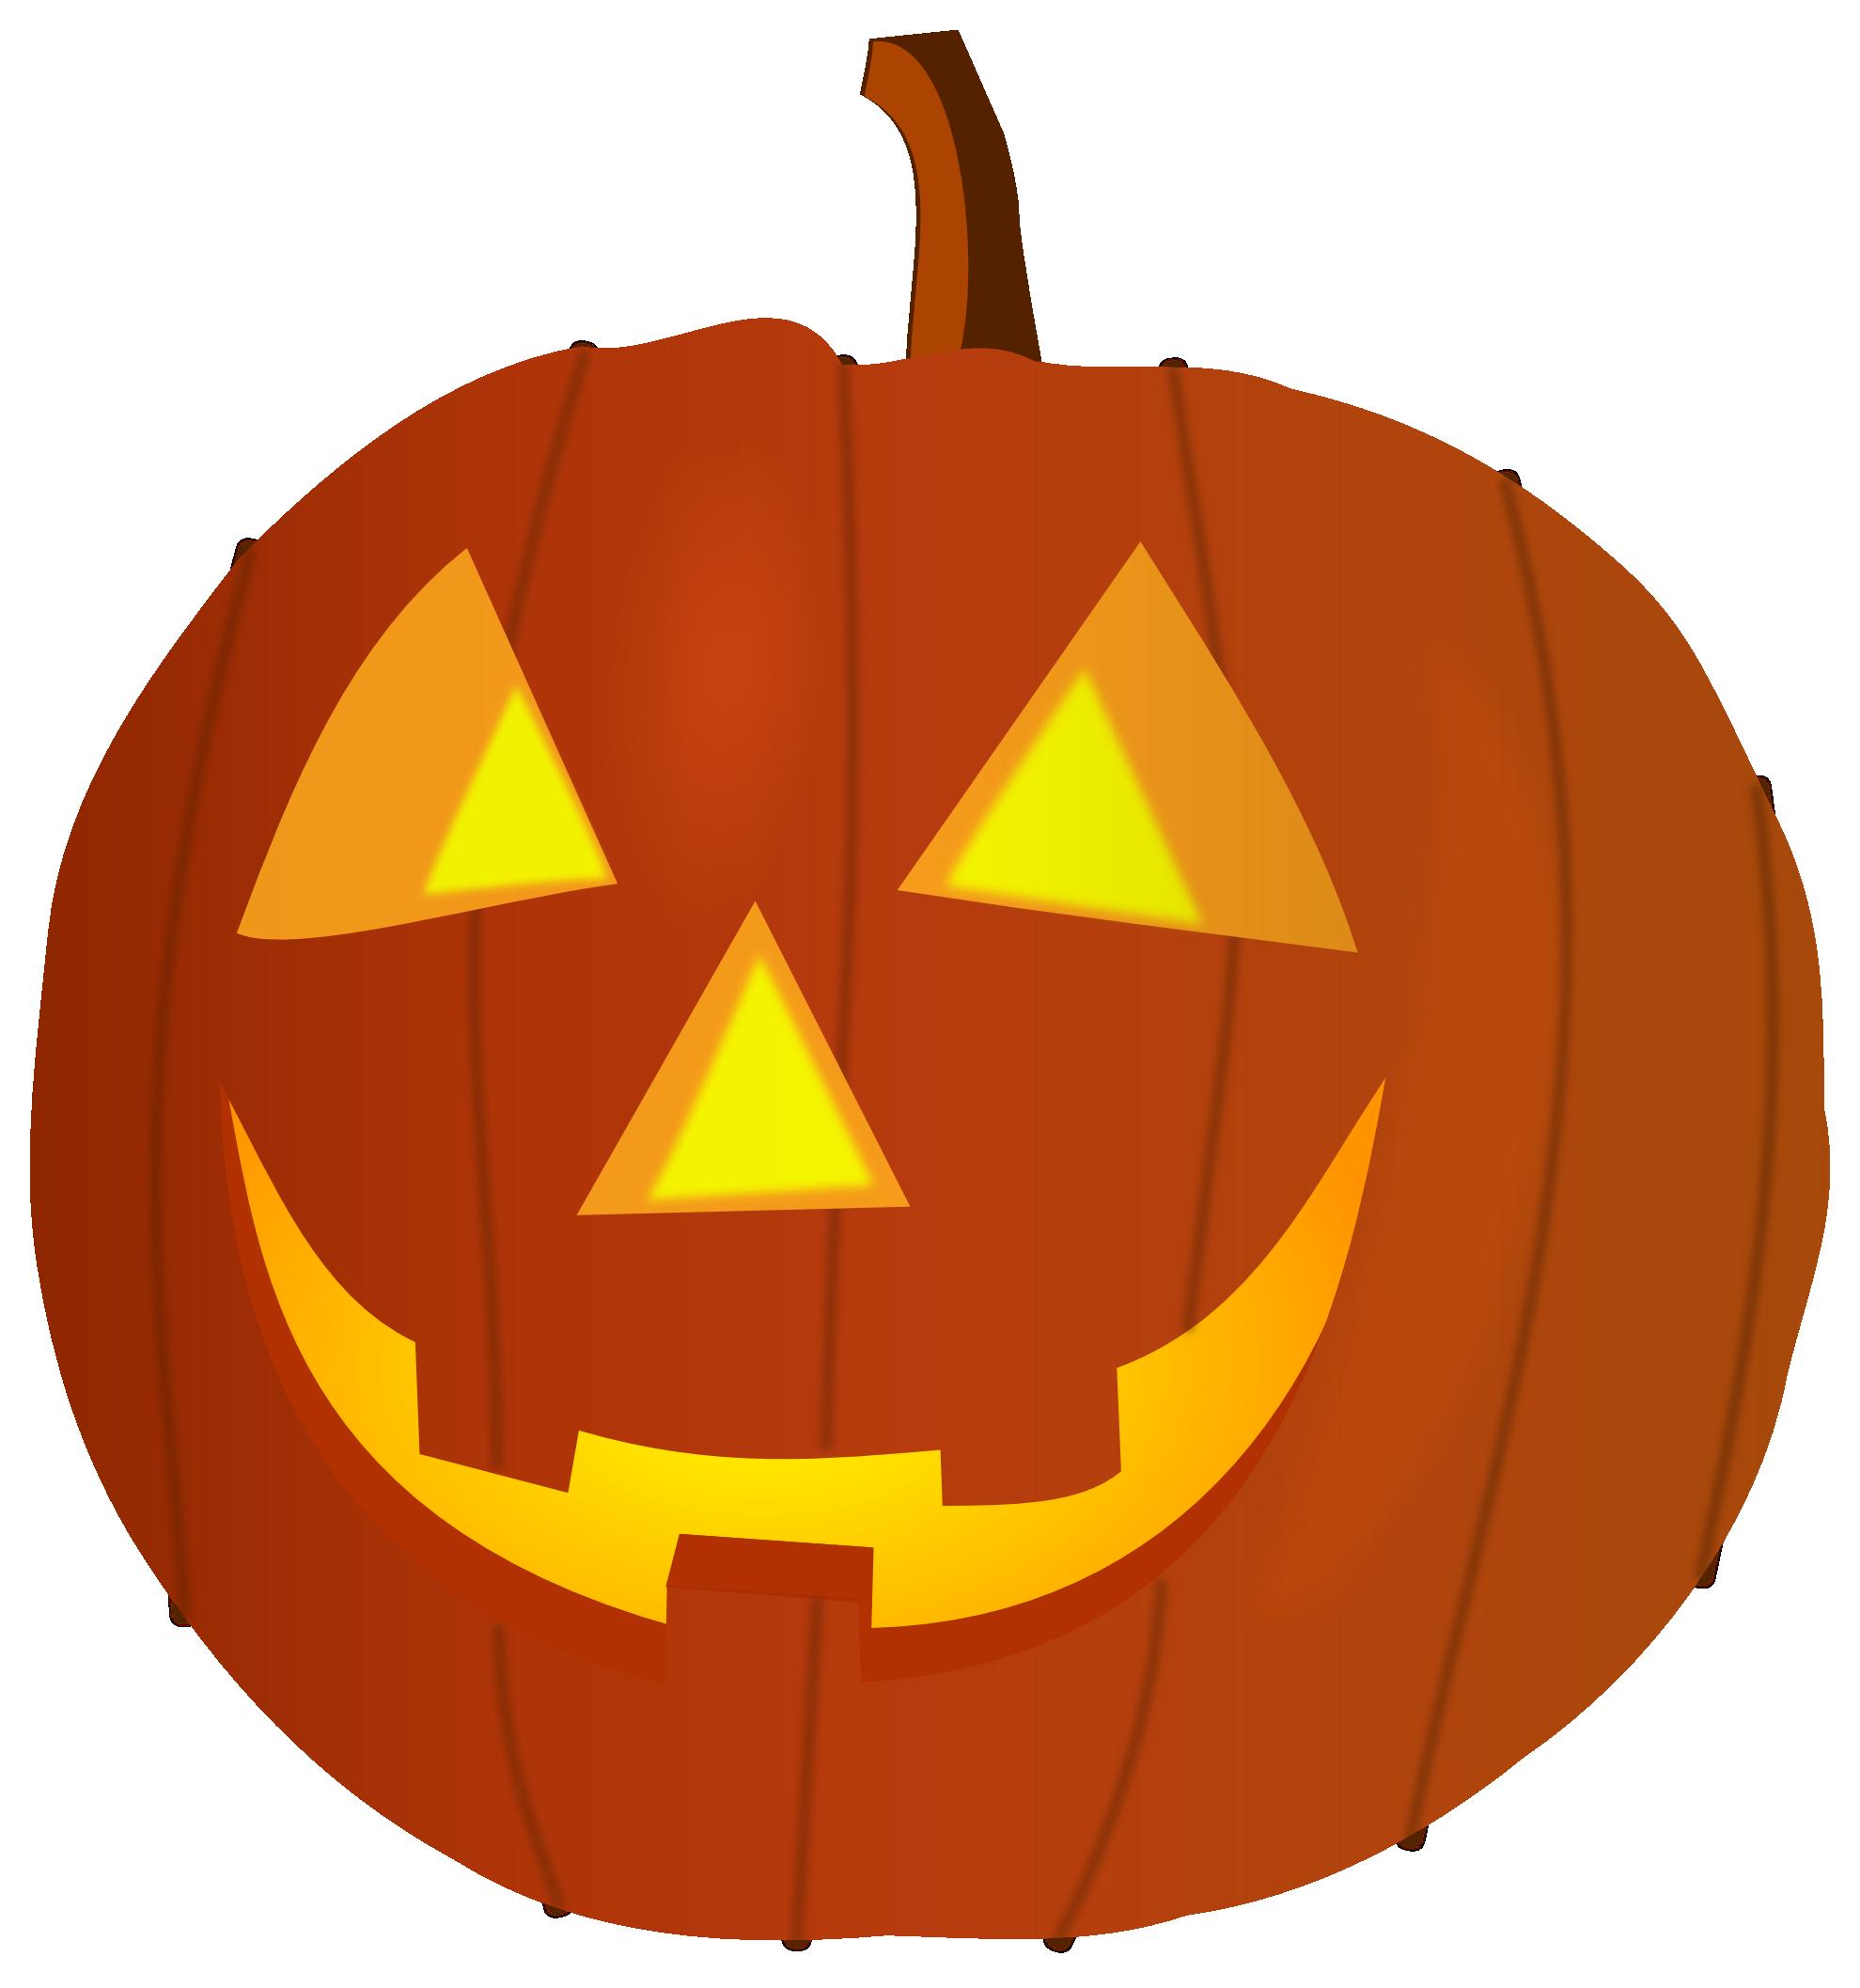 Clip Art: Citrouille Halloween Pumpkin Scalable.